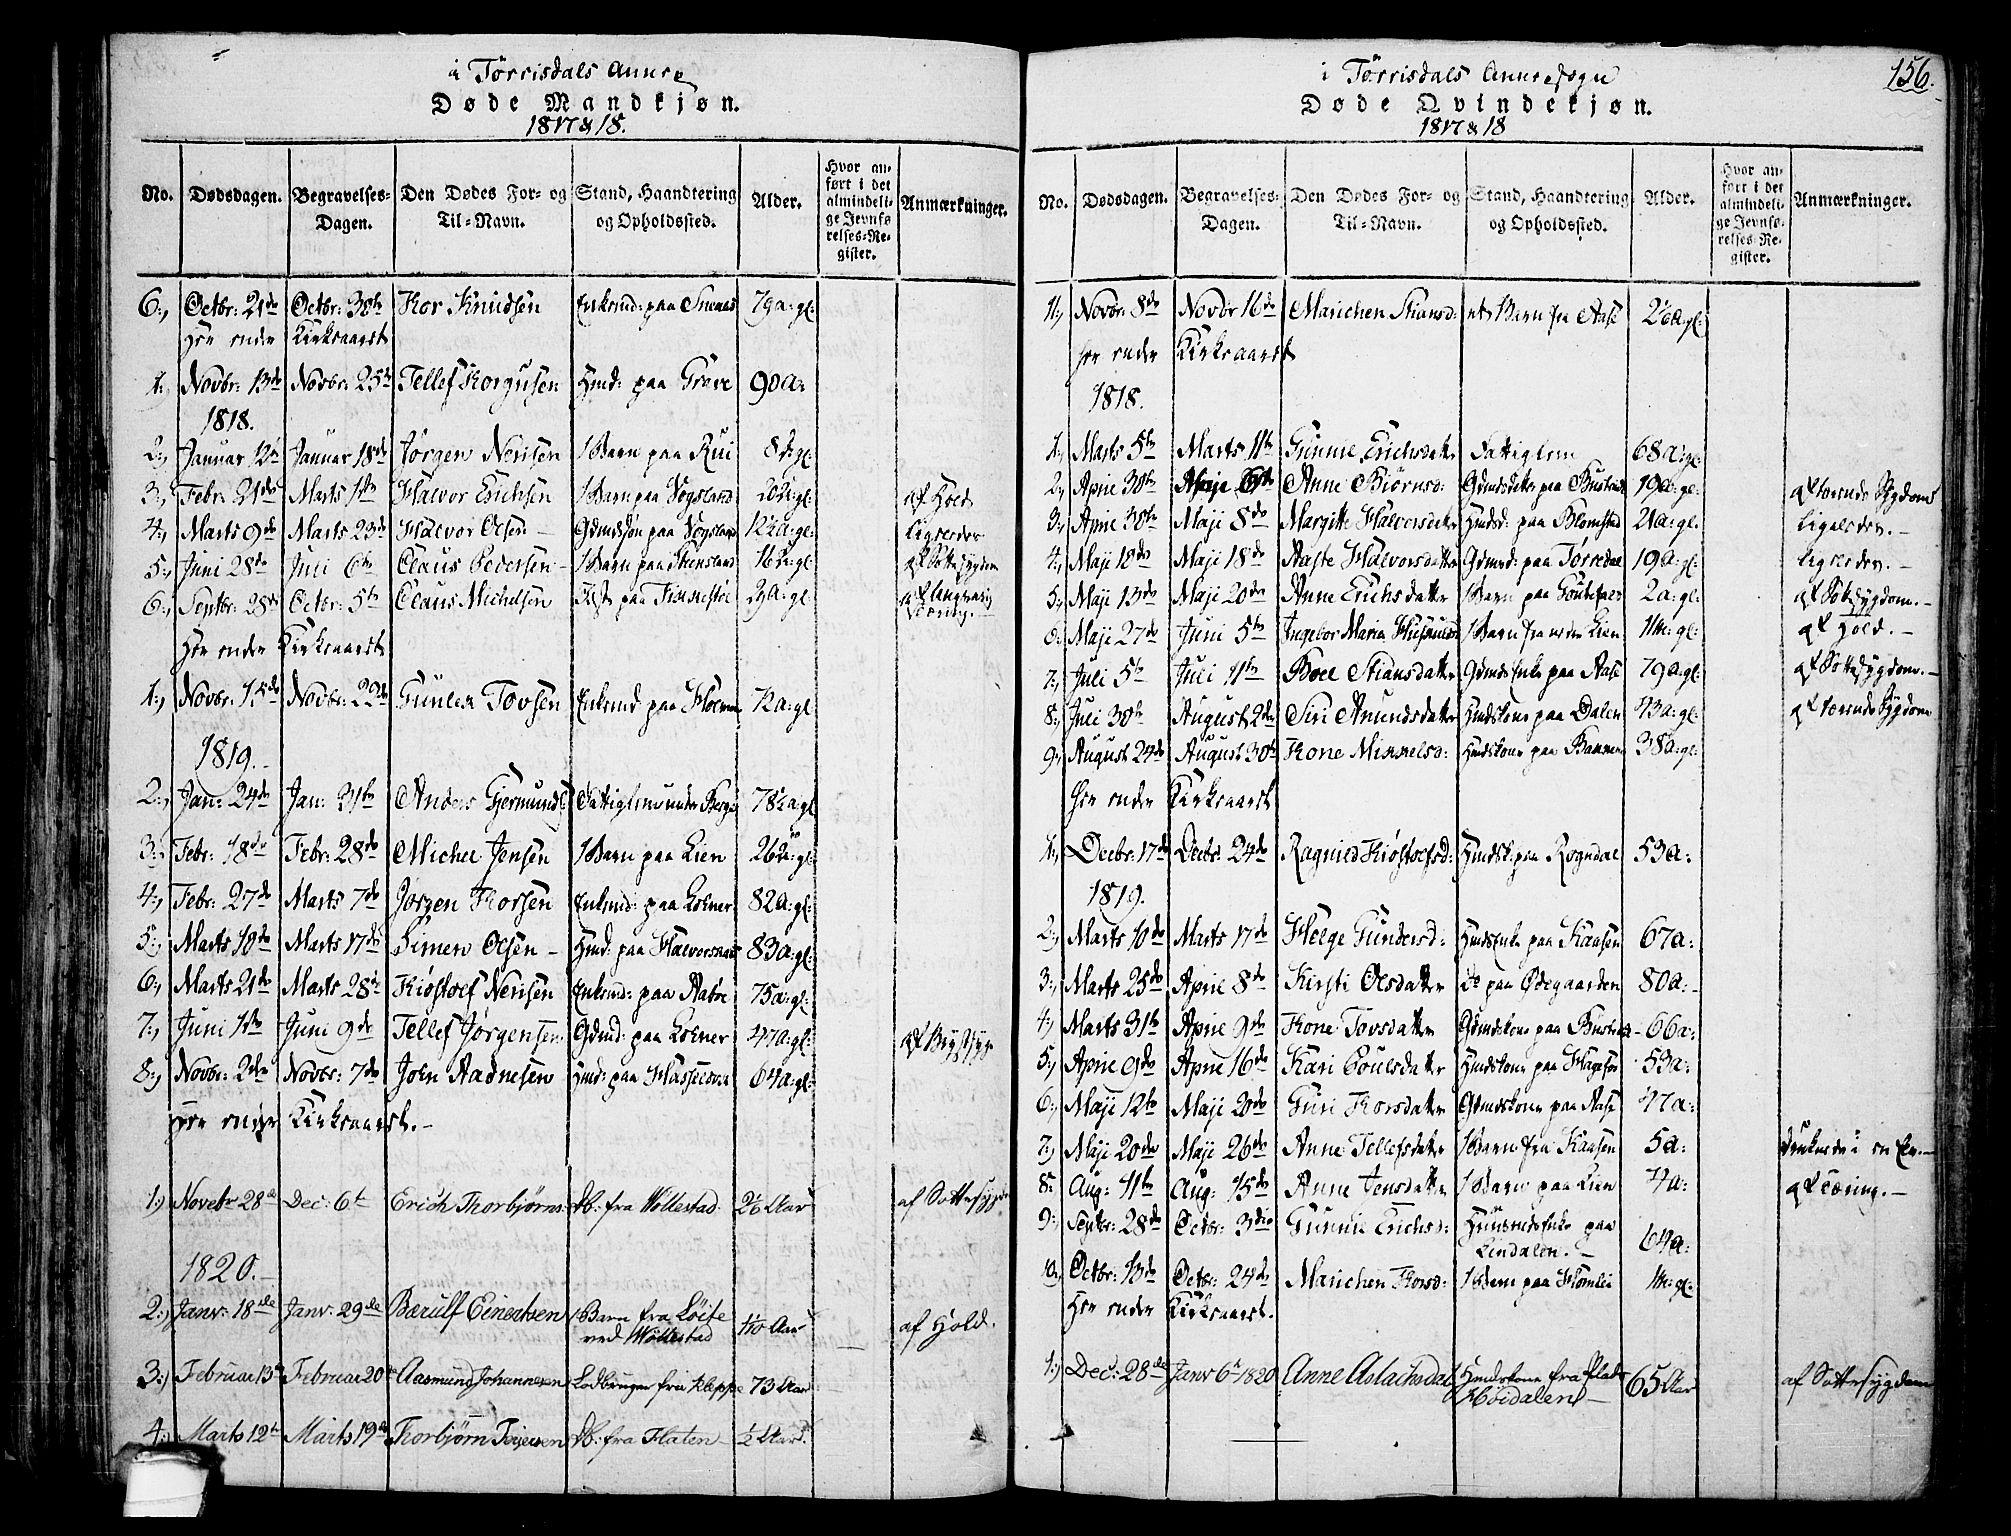 SAKO, Drangedal kirkebøker, F/Fa/L0005: Ministerialbok nr. 5 /2, 1814-1831, s. 156